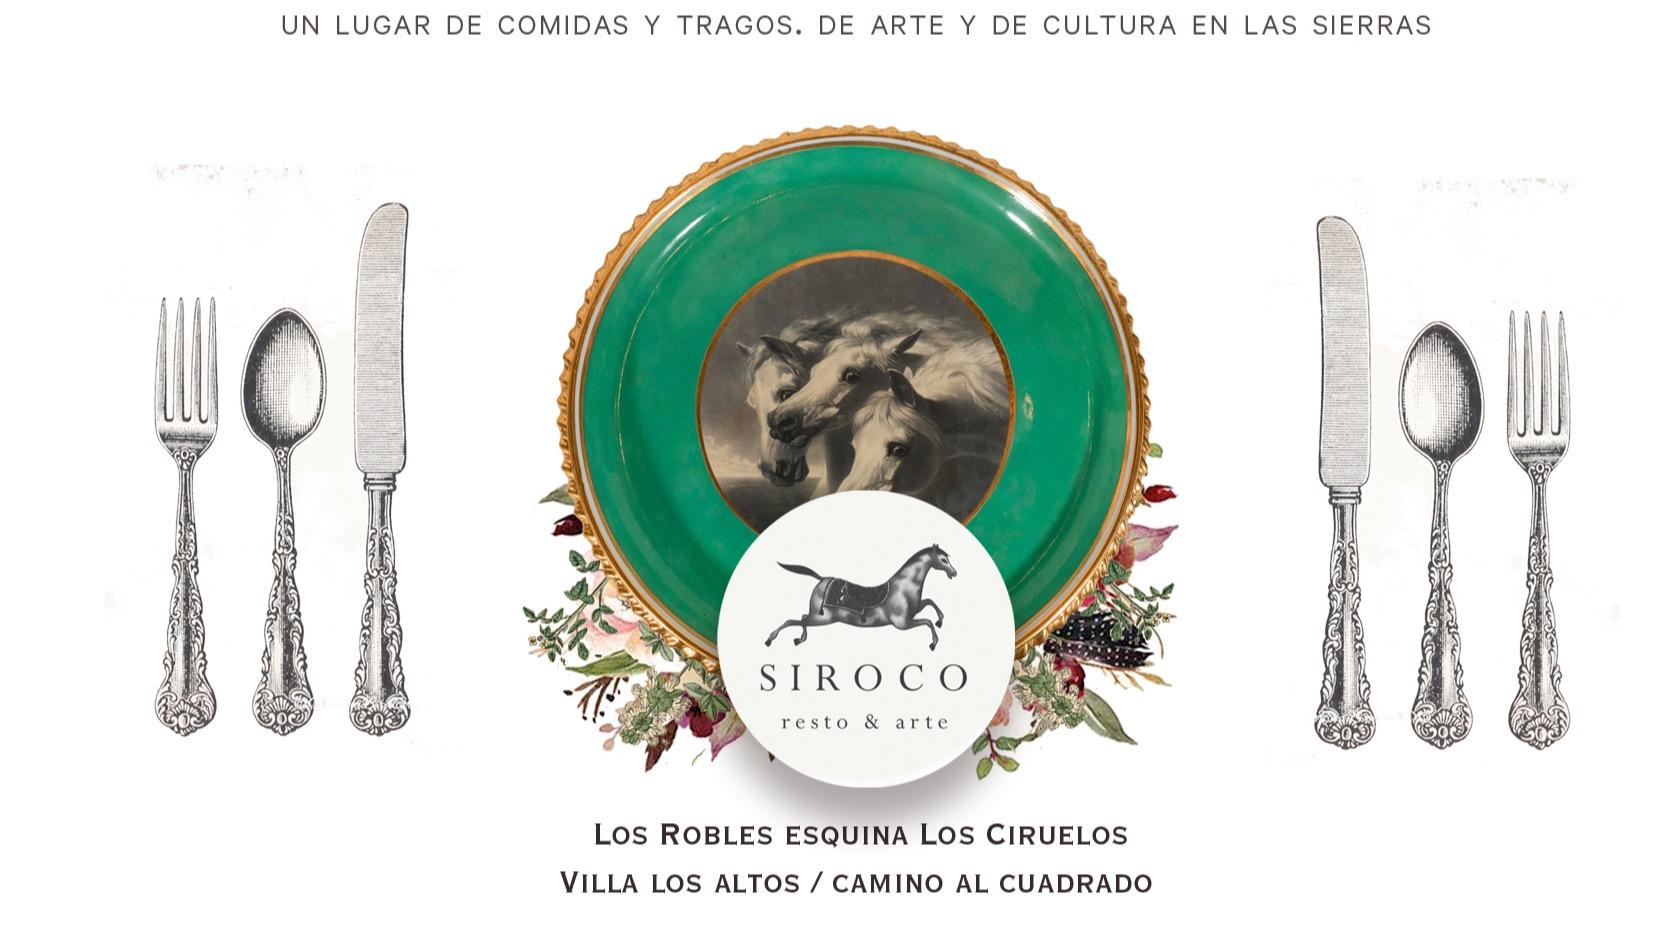 SIROCO RESTO & ARTE SIROCO RESTO & ARTE Río Ceballos, Córdoba, Argentina